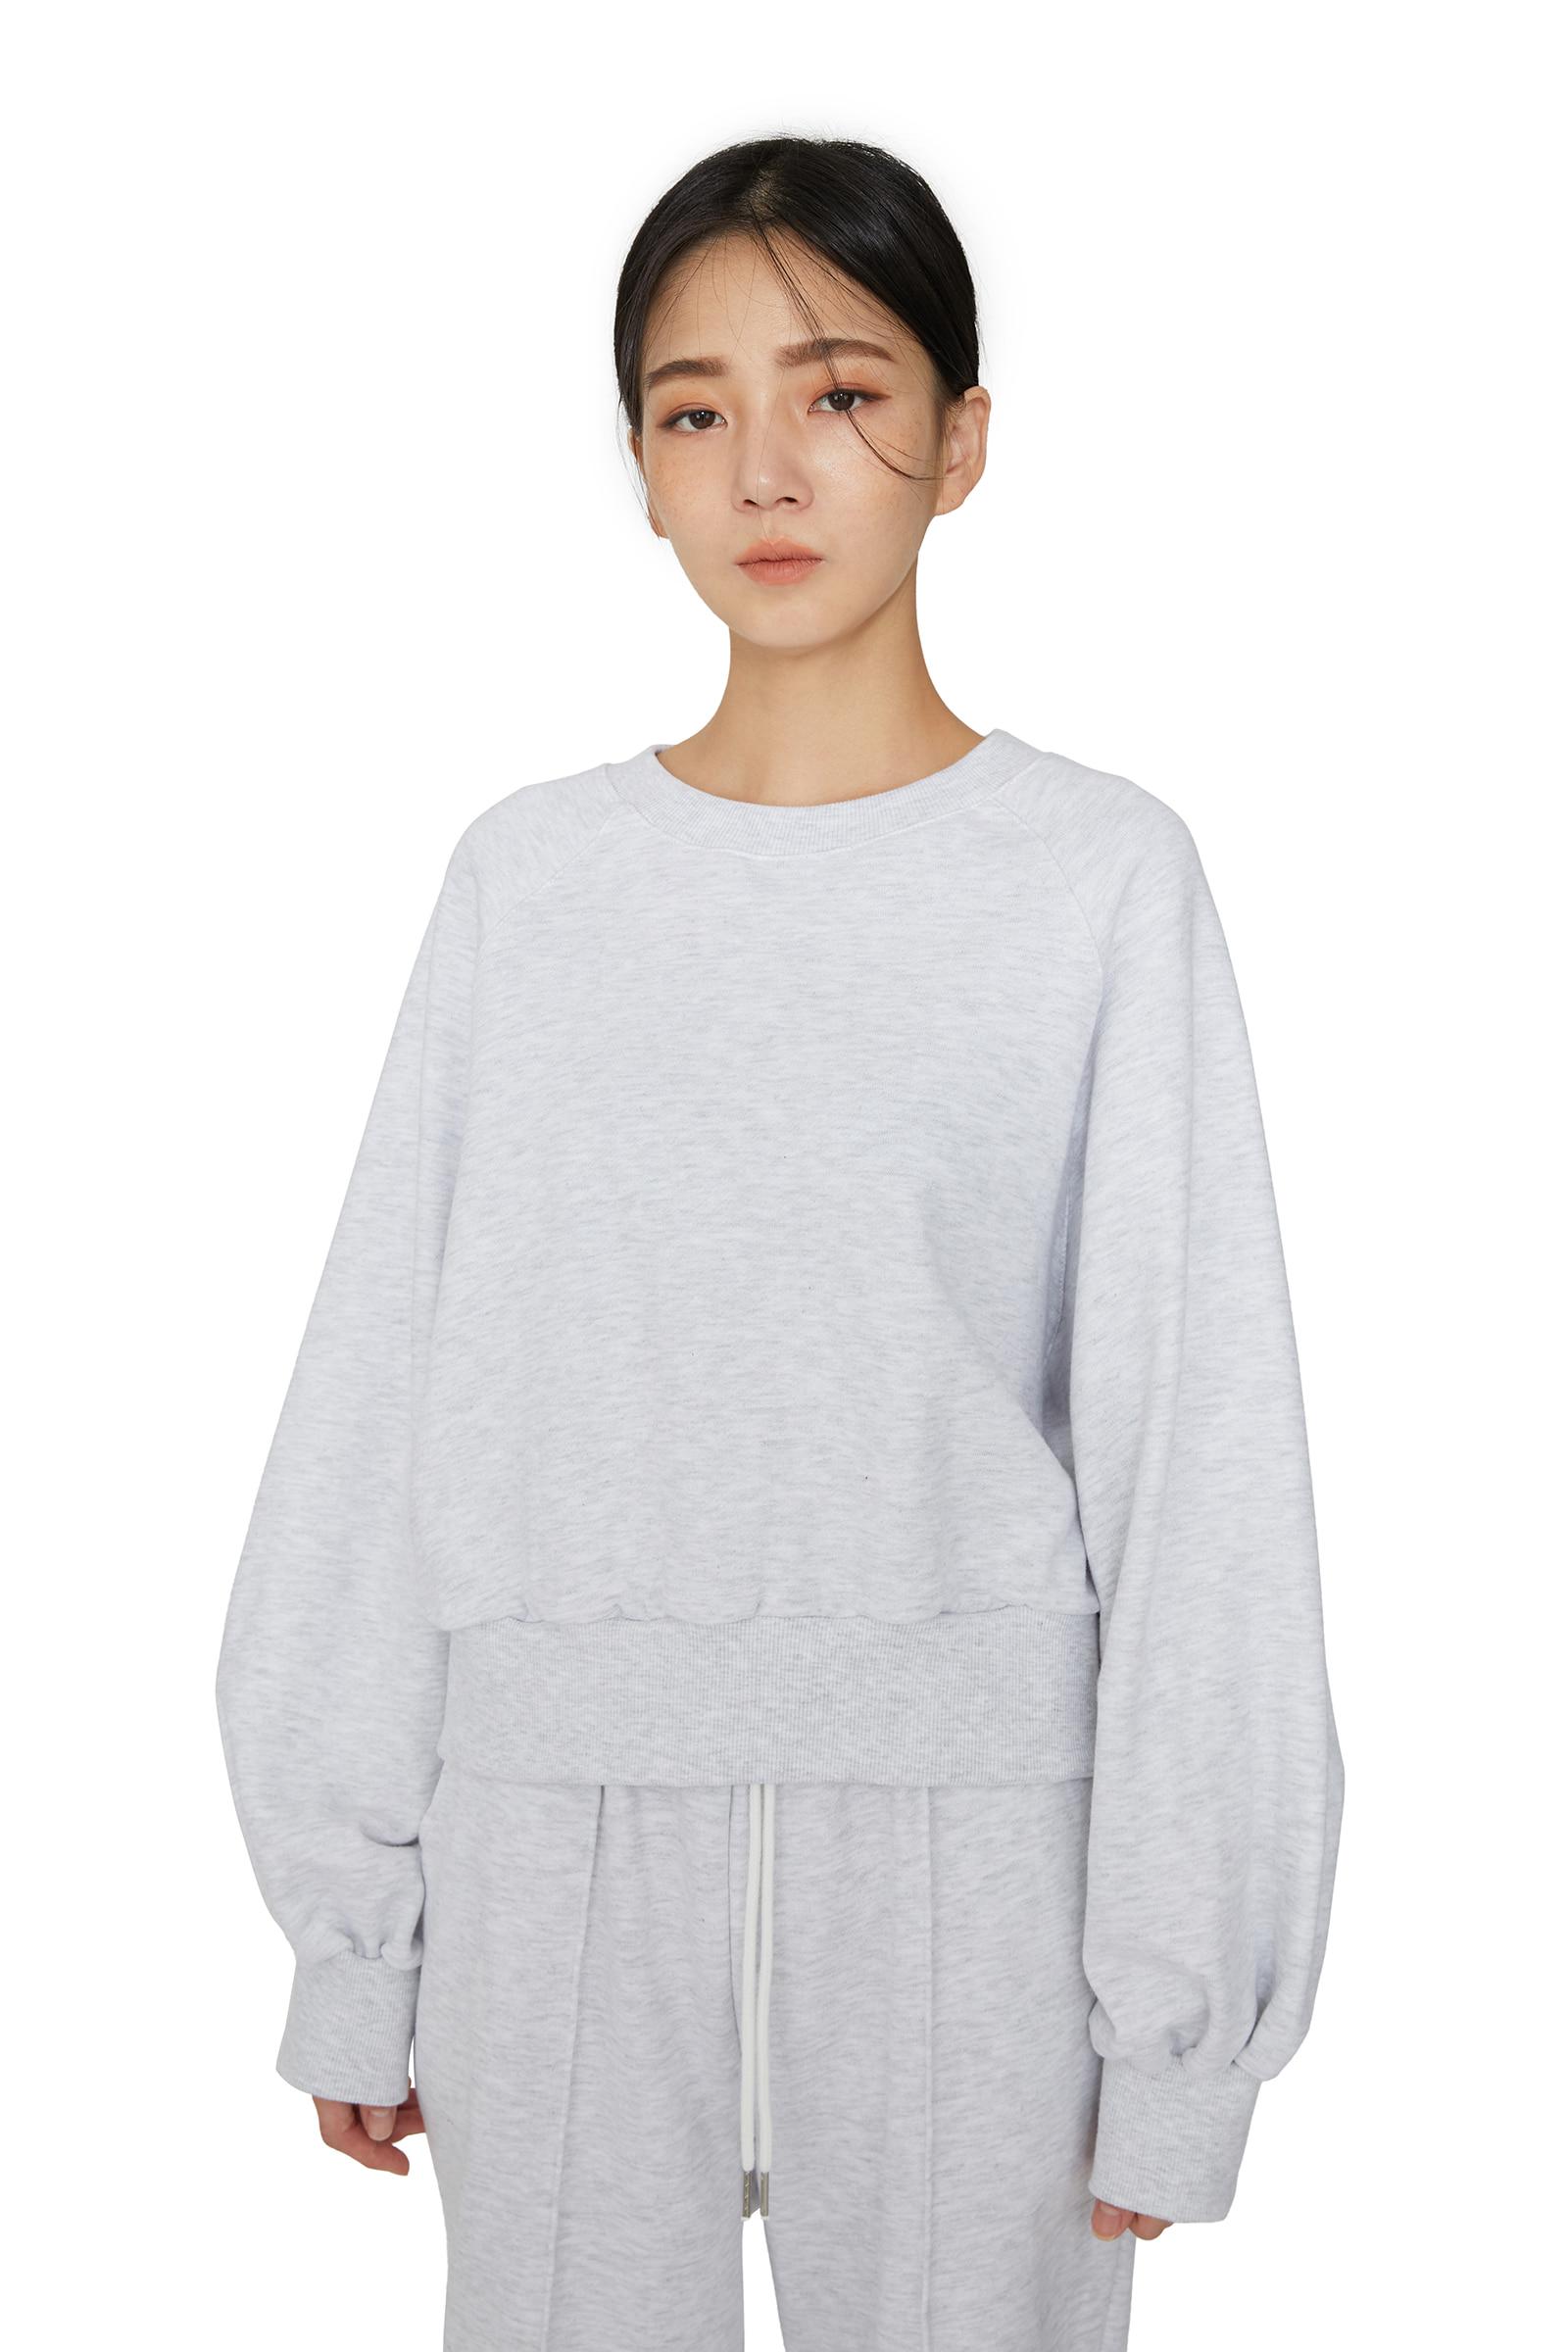 Oz soft cotton crew neck sweatshirt